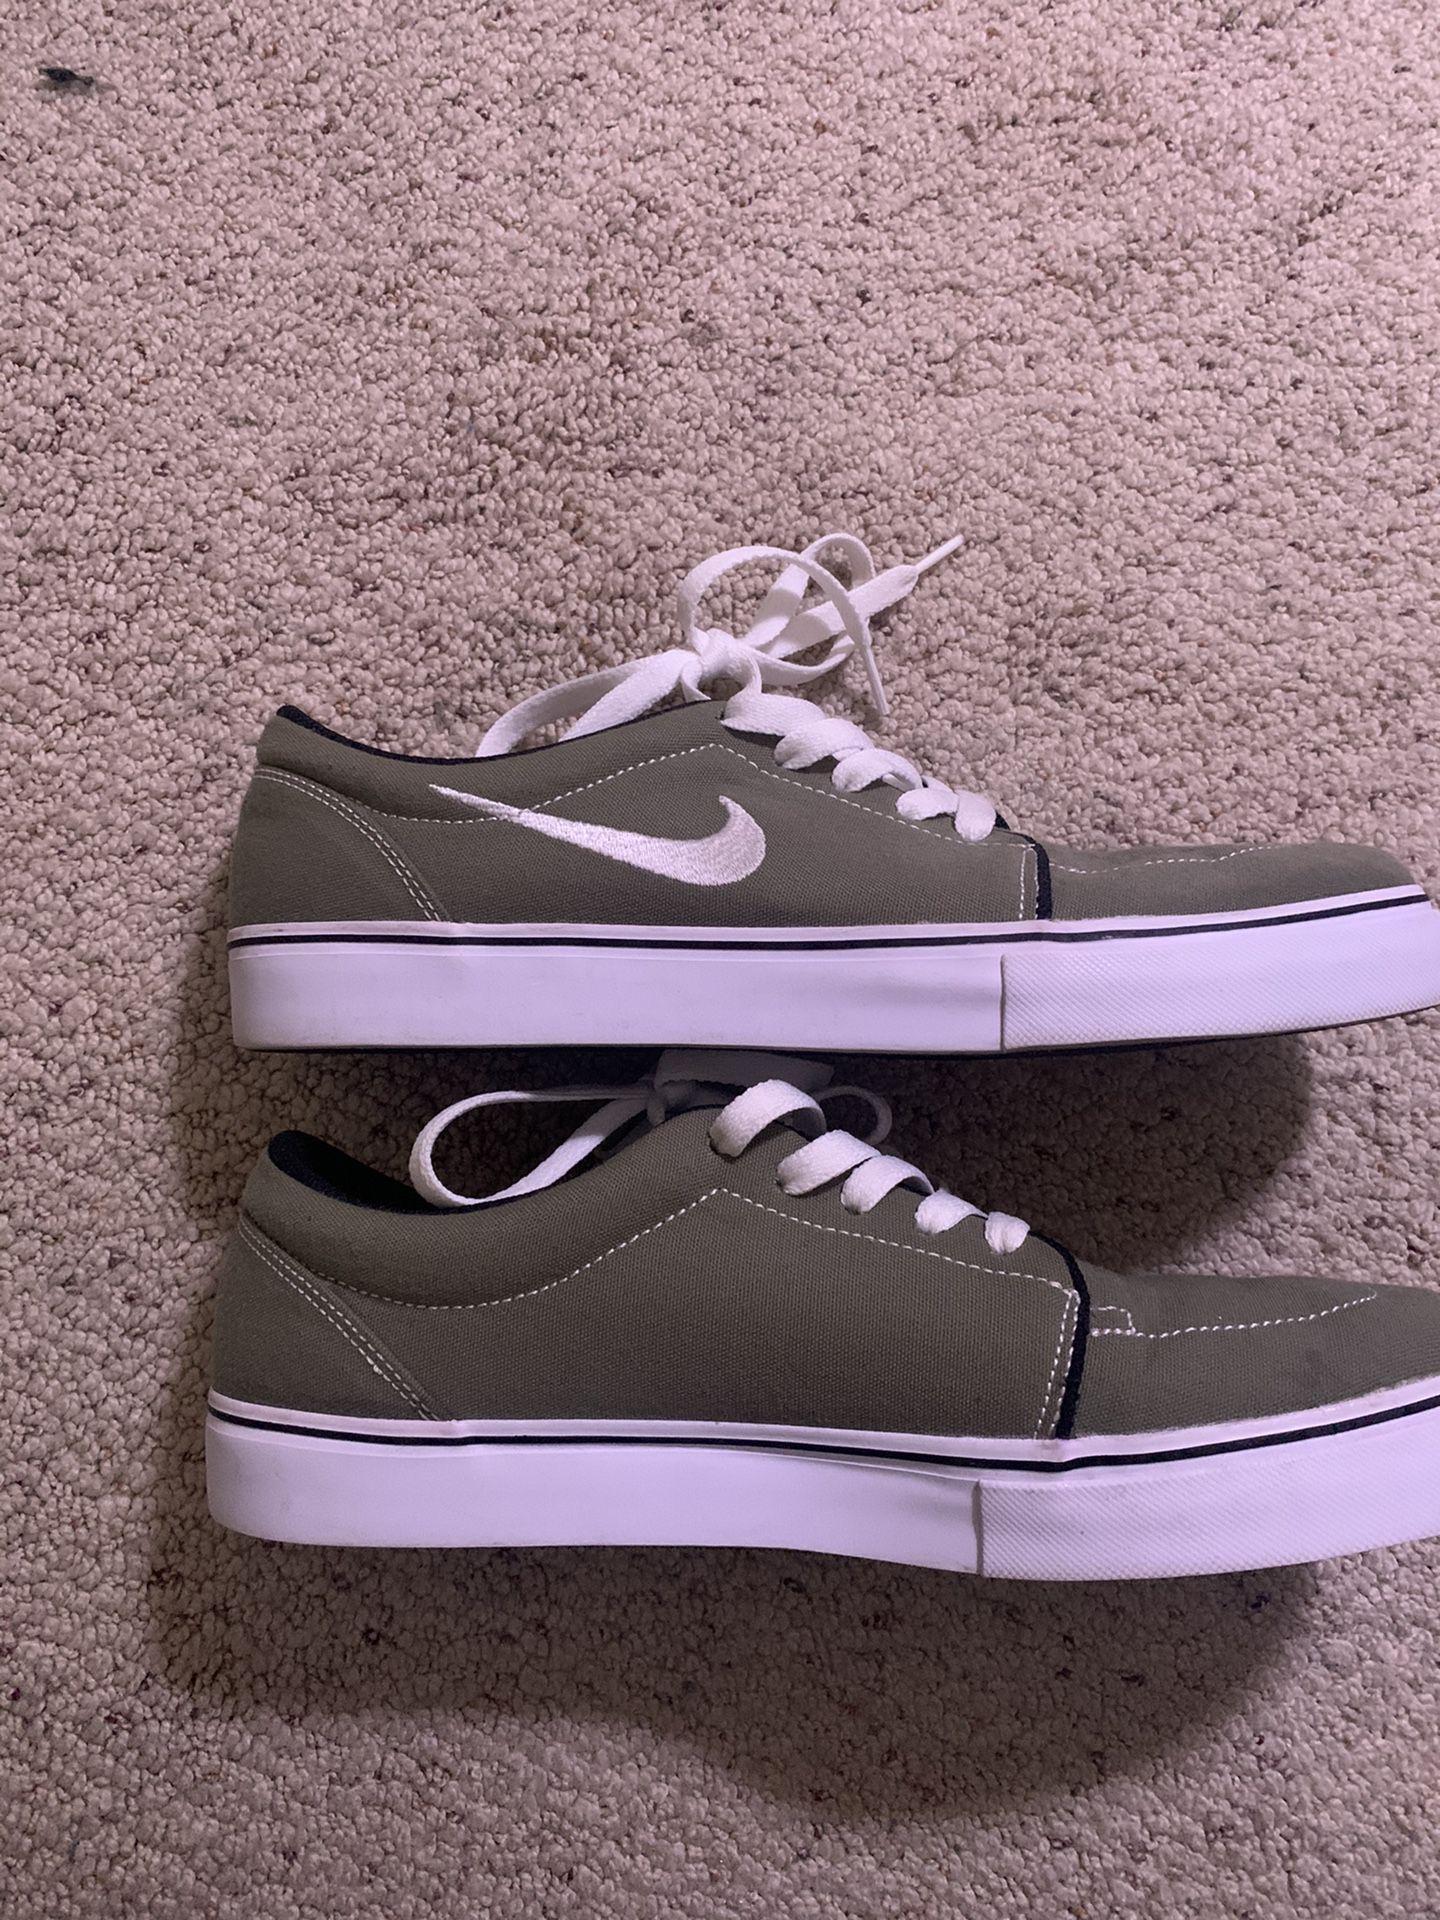 Nike SBs Green